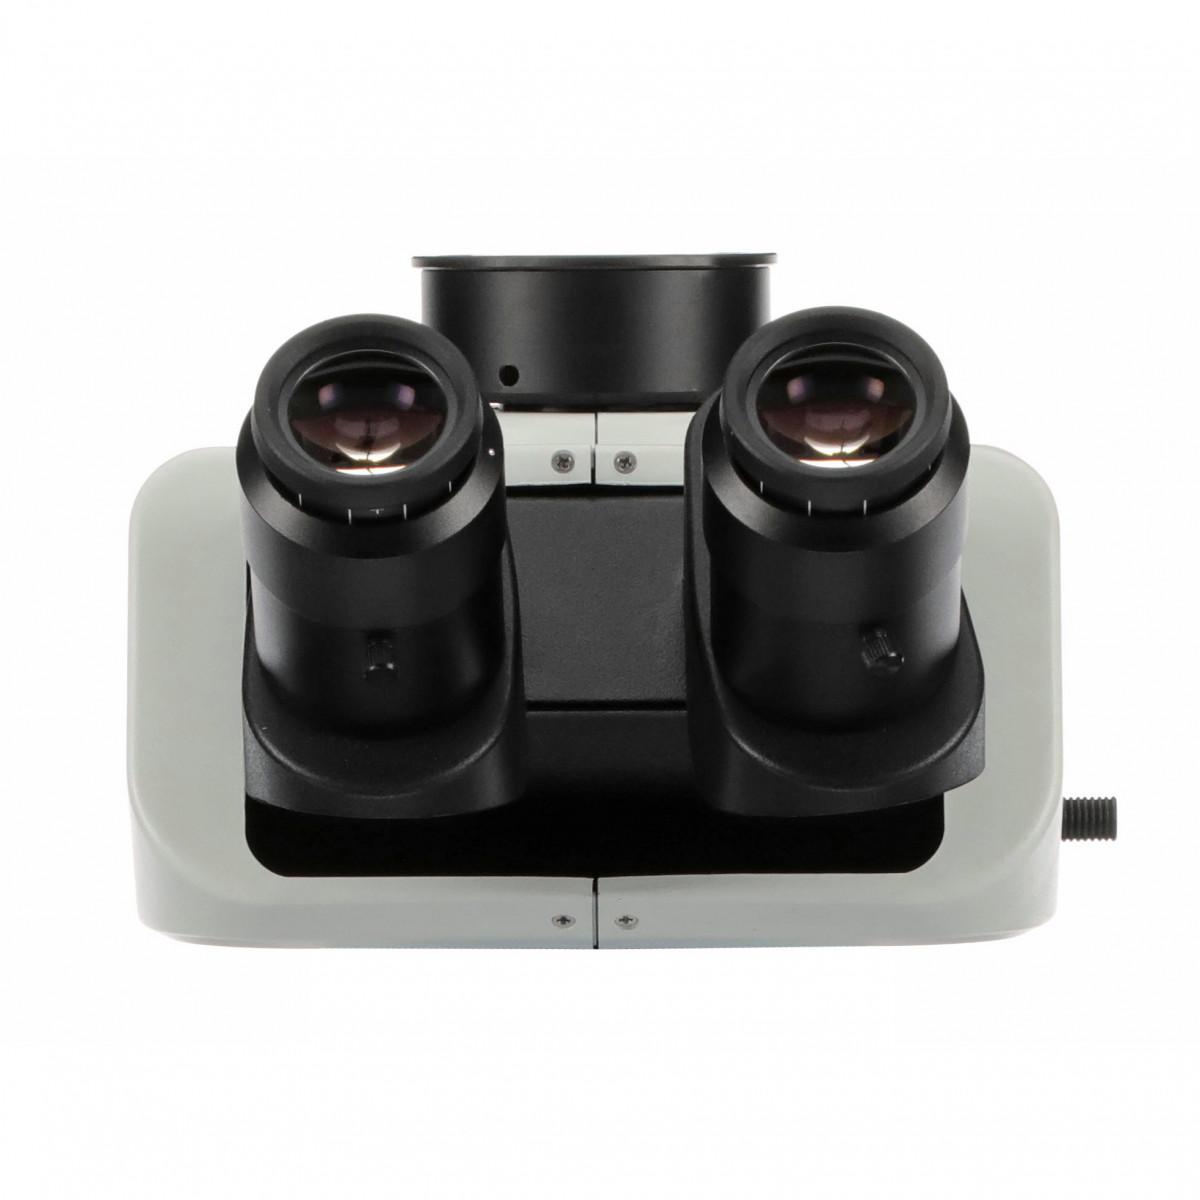 112-11-03 ErgoTrinocular Viewing Head - Z12 Series - Front View